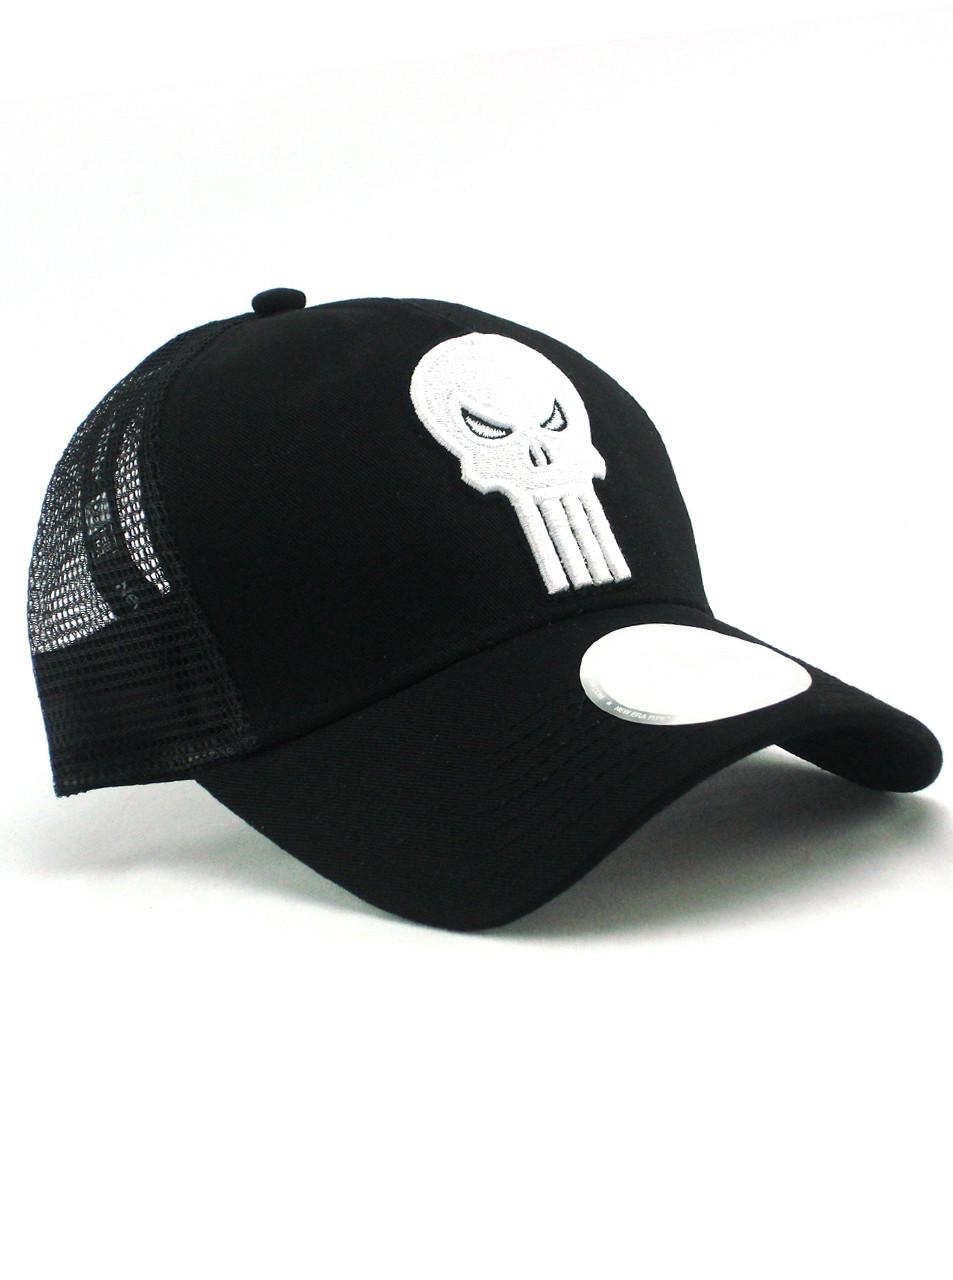 New Era Punisher Adjustable Trucker Hat View 1 f778e1e5cd0